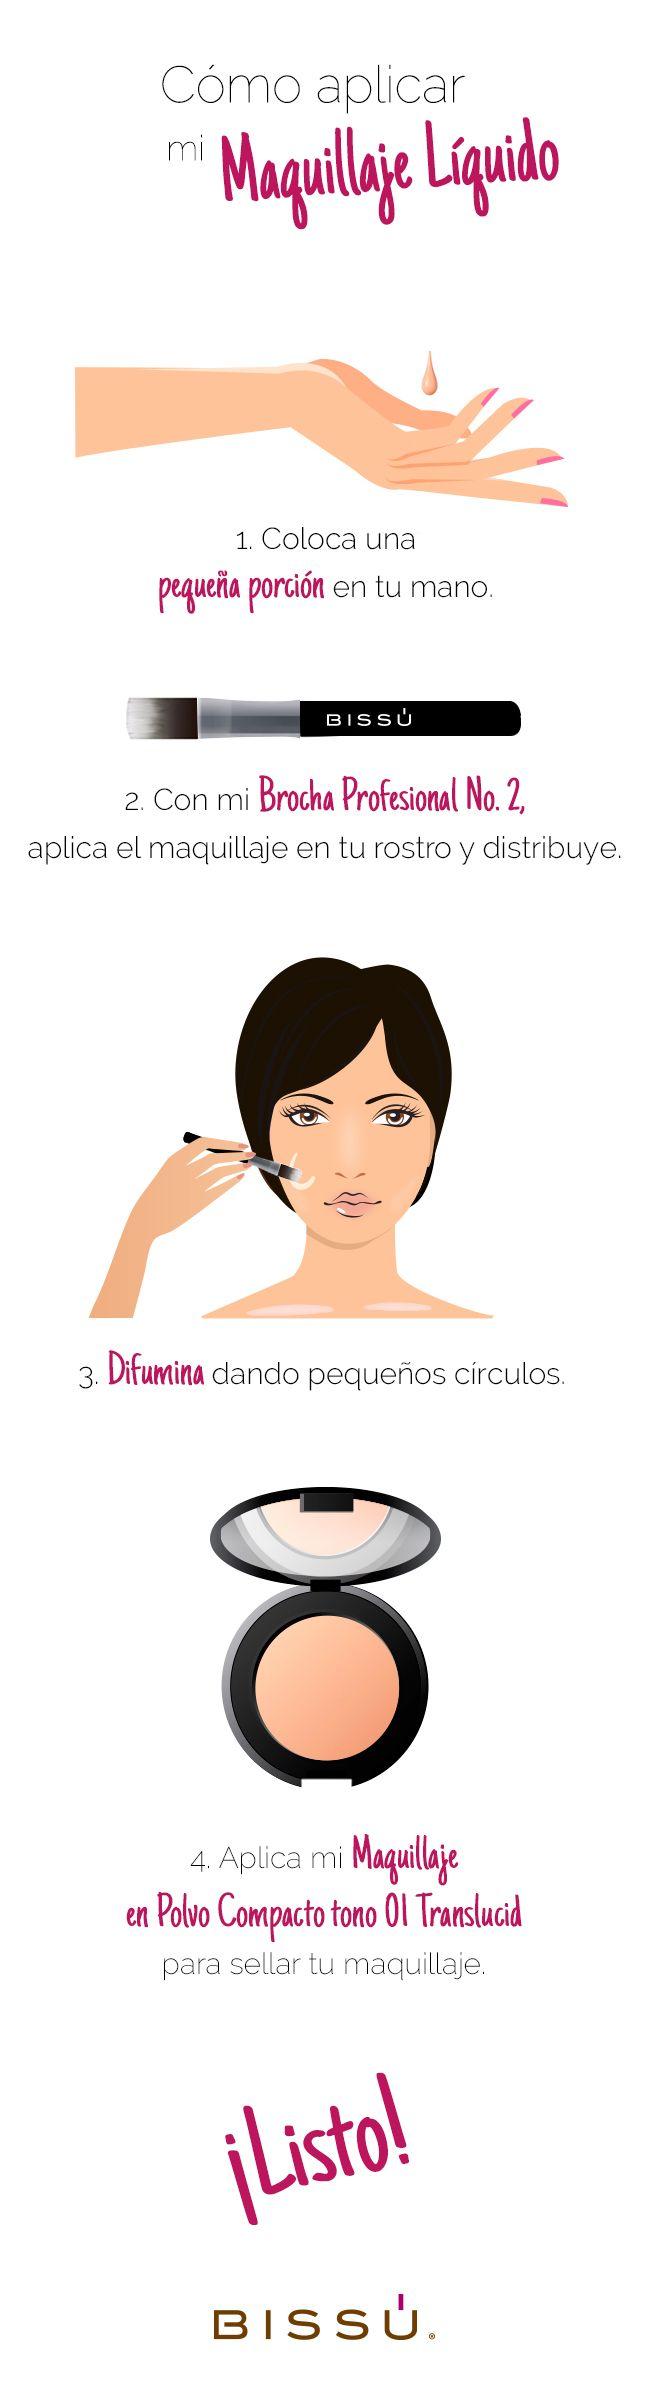 Aplica correcamente tu Maquilaje Líquido. http://tiendaweb.bissu.com/rostro/205-maquillaje-liquido.html